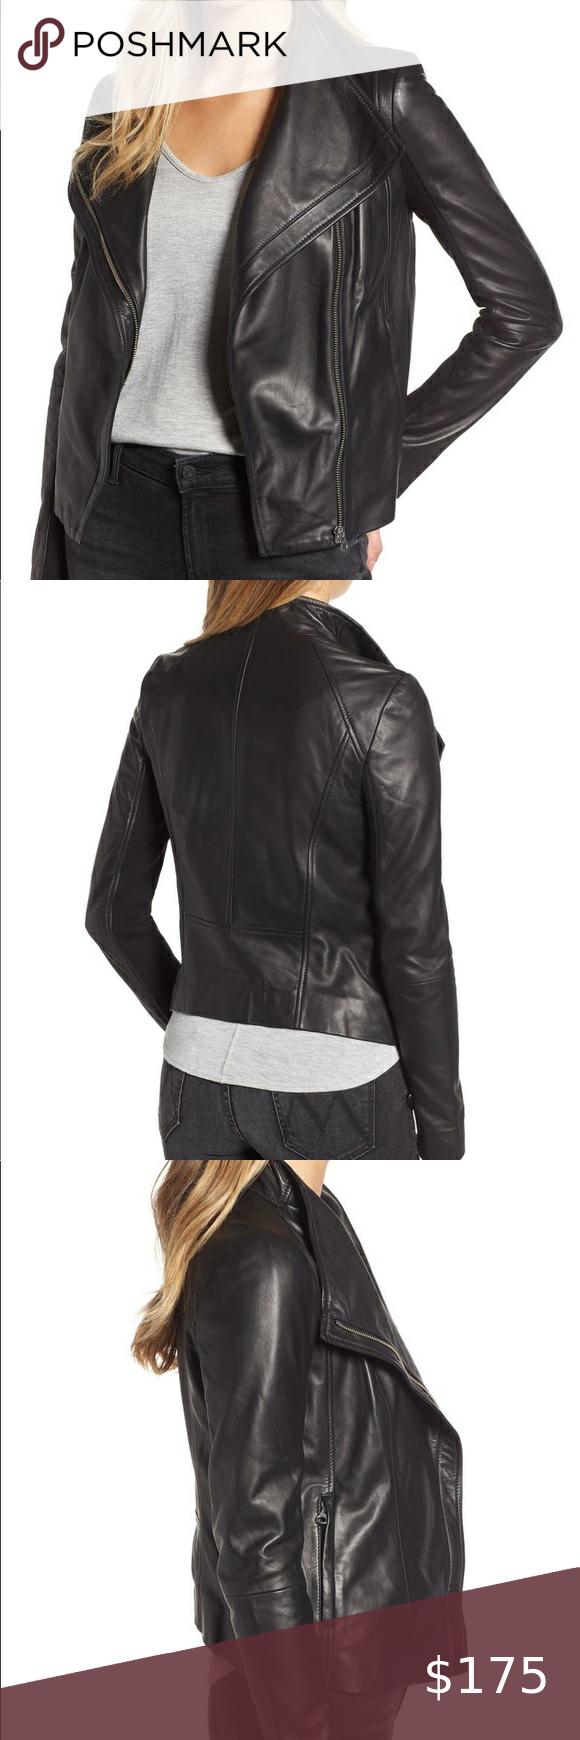 New Chelsea 28 Leather Moto Jacket Grey Leather Jacket Leather Moto Jacket Black Leather Moto Jacket [ 1740 x 580 Pixel ]